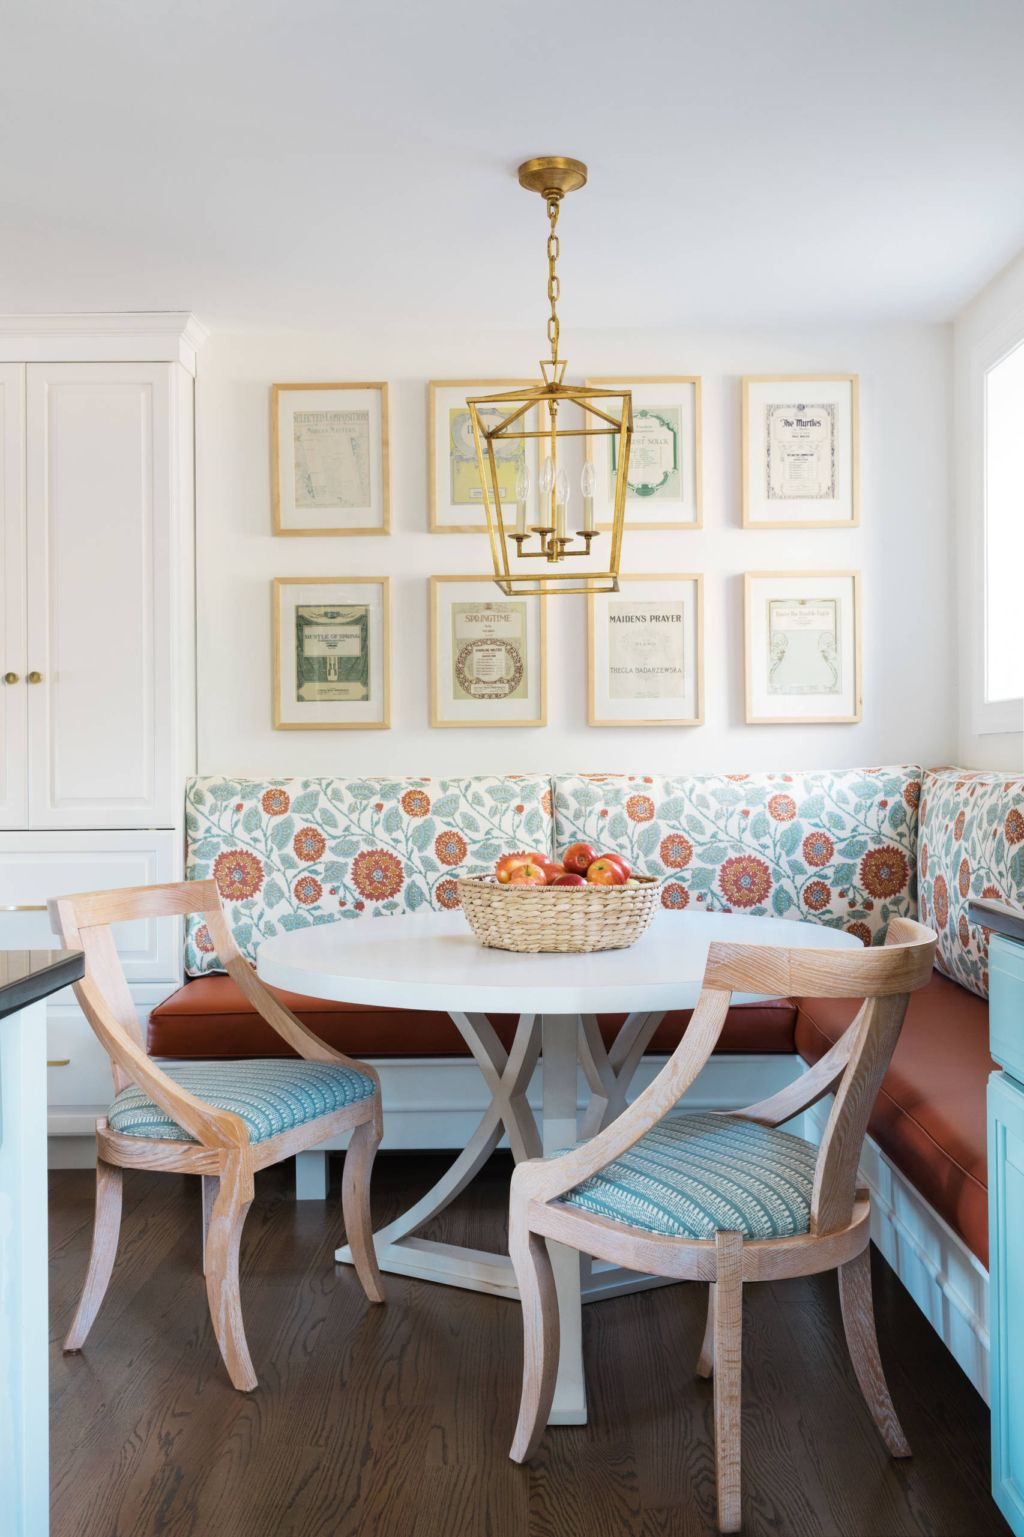 15 The Old Reader Dining Nook Kitchen Seating Breakfast Nook